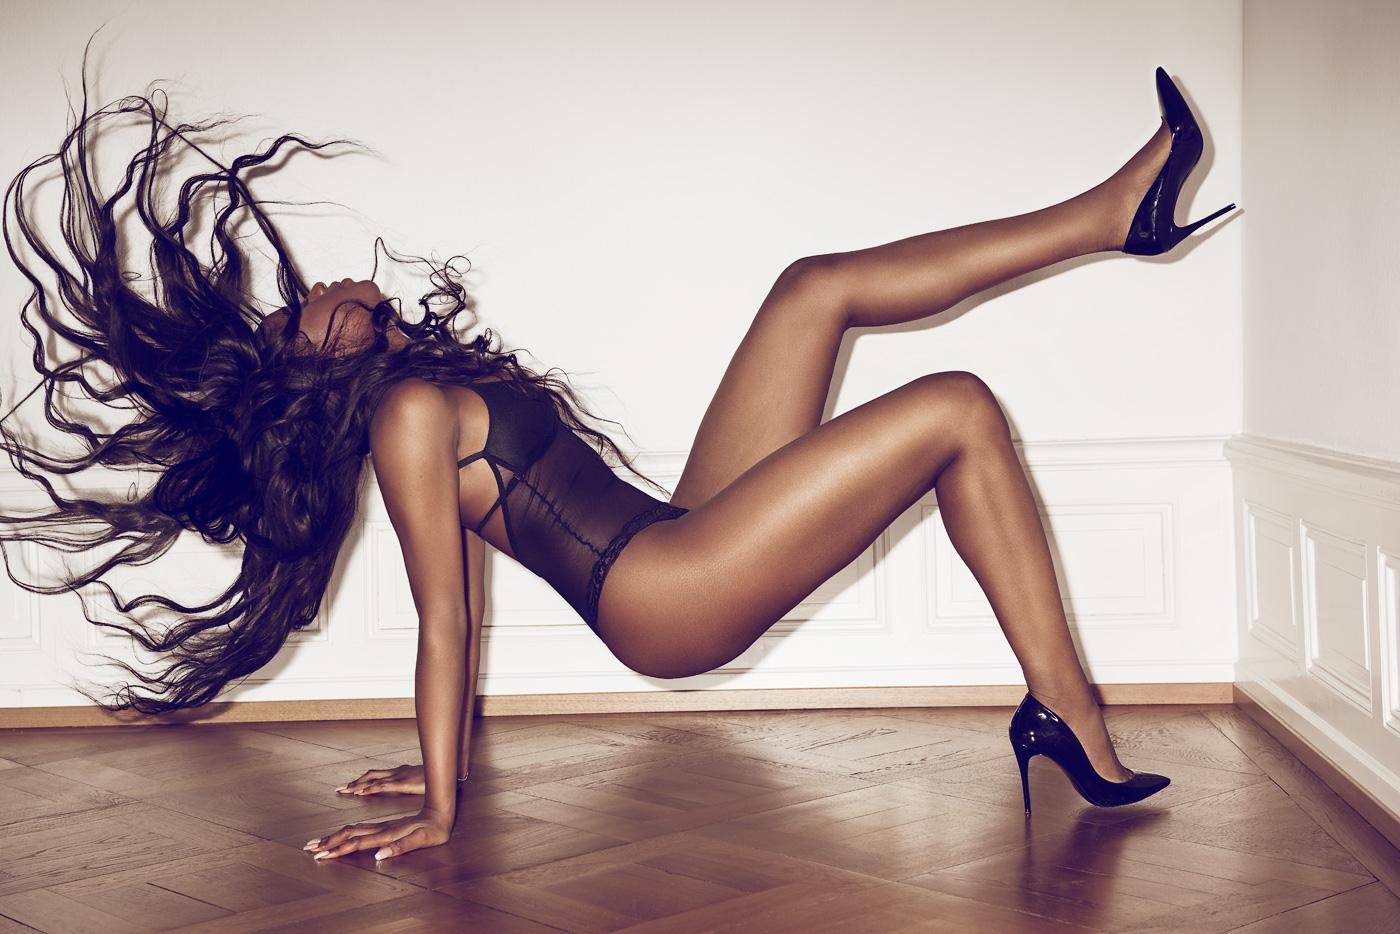 Sunday fais ce qu'il te play. Women    // lionsmag.com - premium nude photography magazine